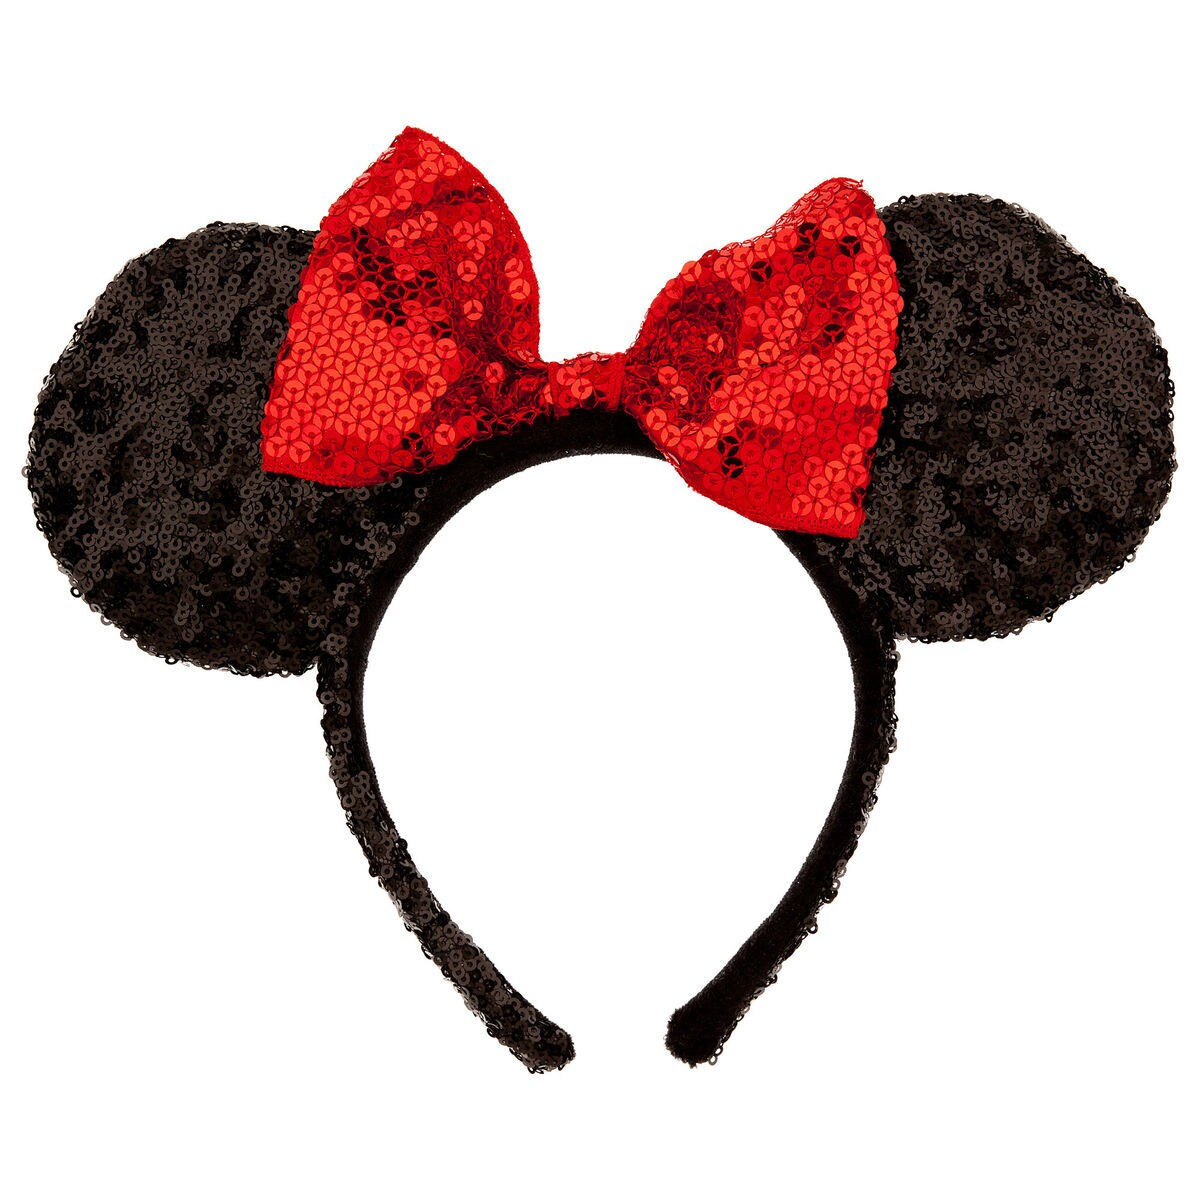 Minnie Mouse Ears Headband Sequined Shopdisney